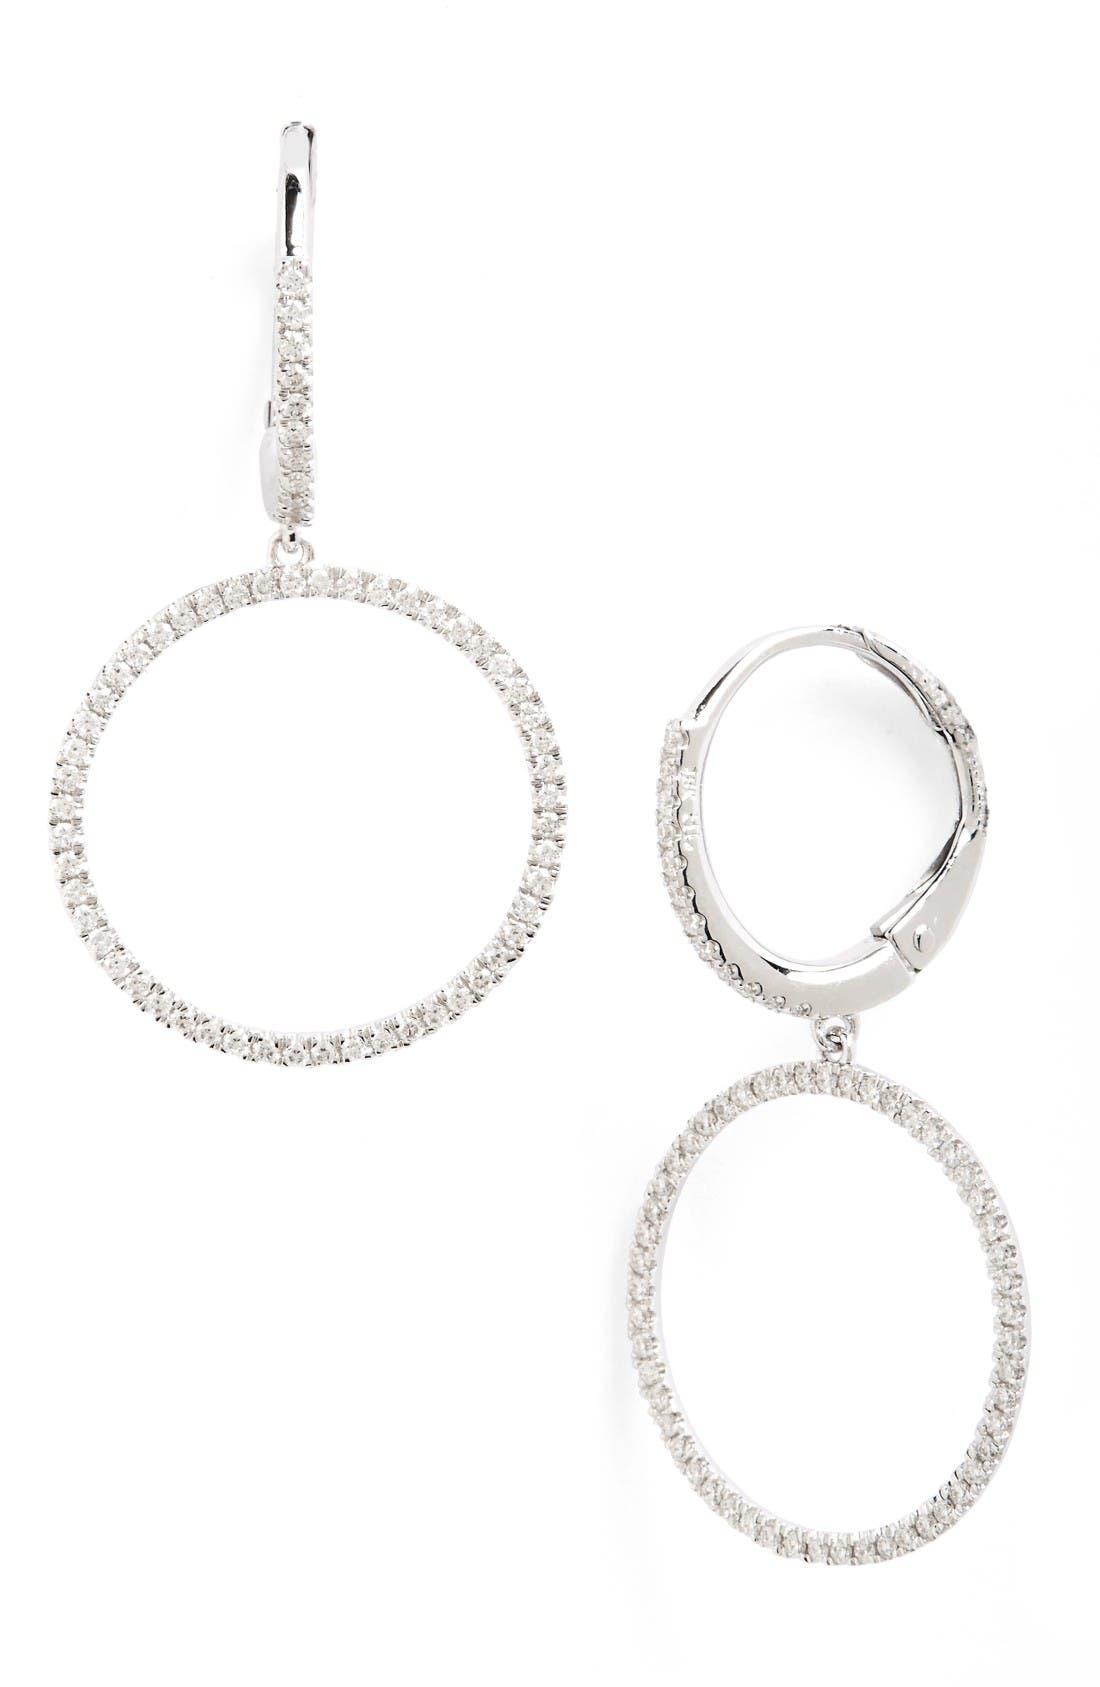 Diamond Frontal Hoop Earrings,                         Main,                         color, White Gold